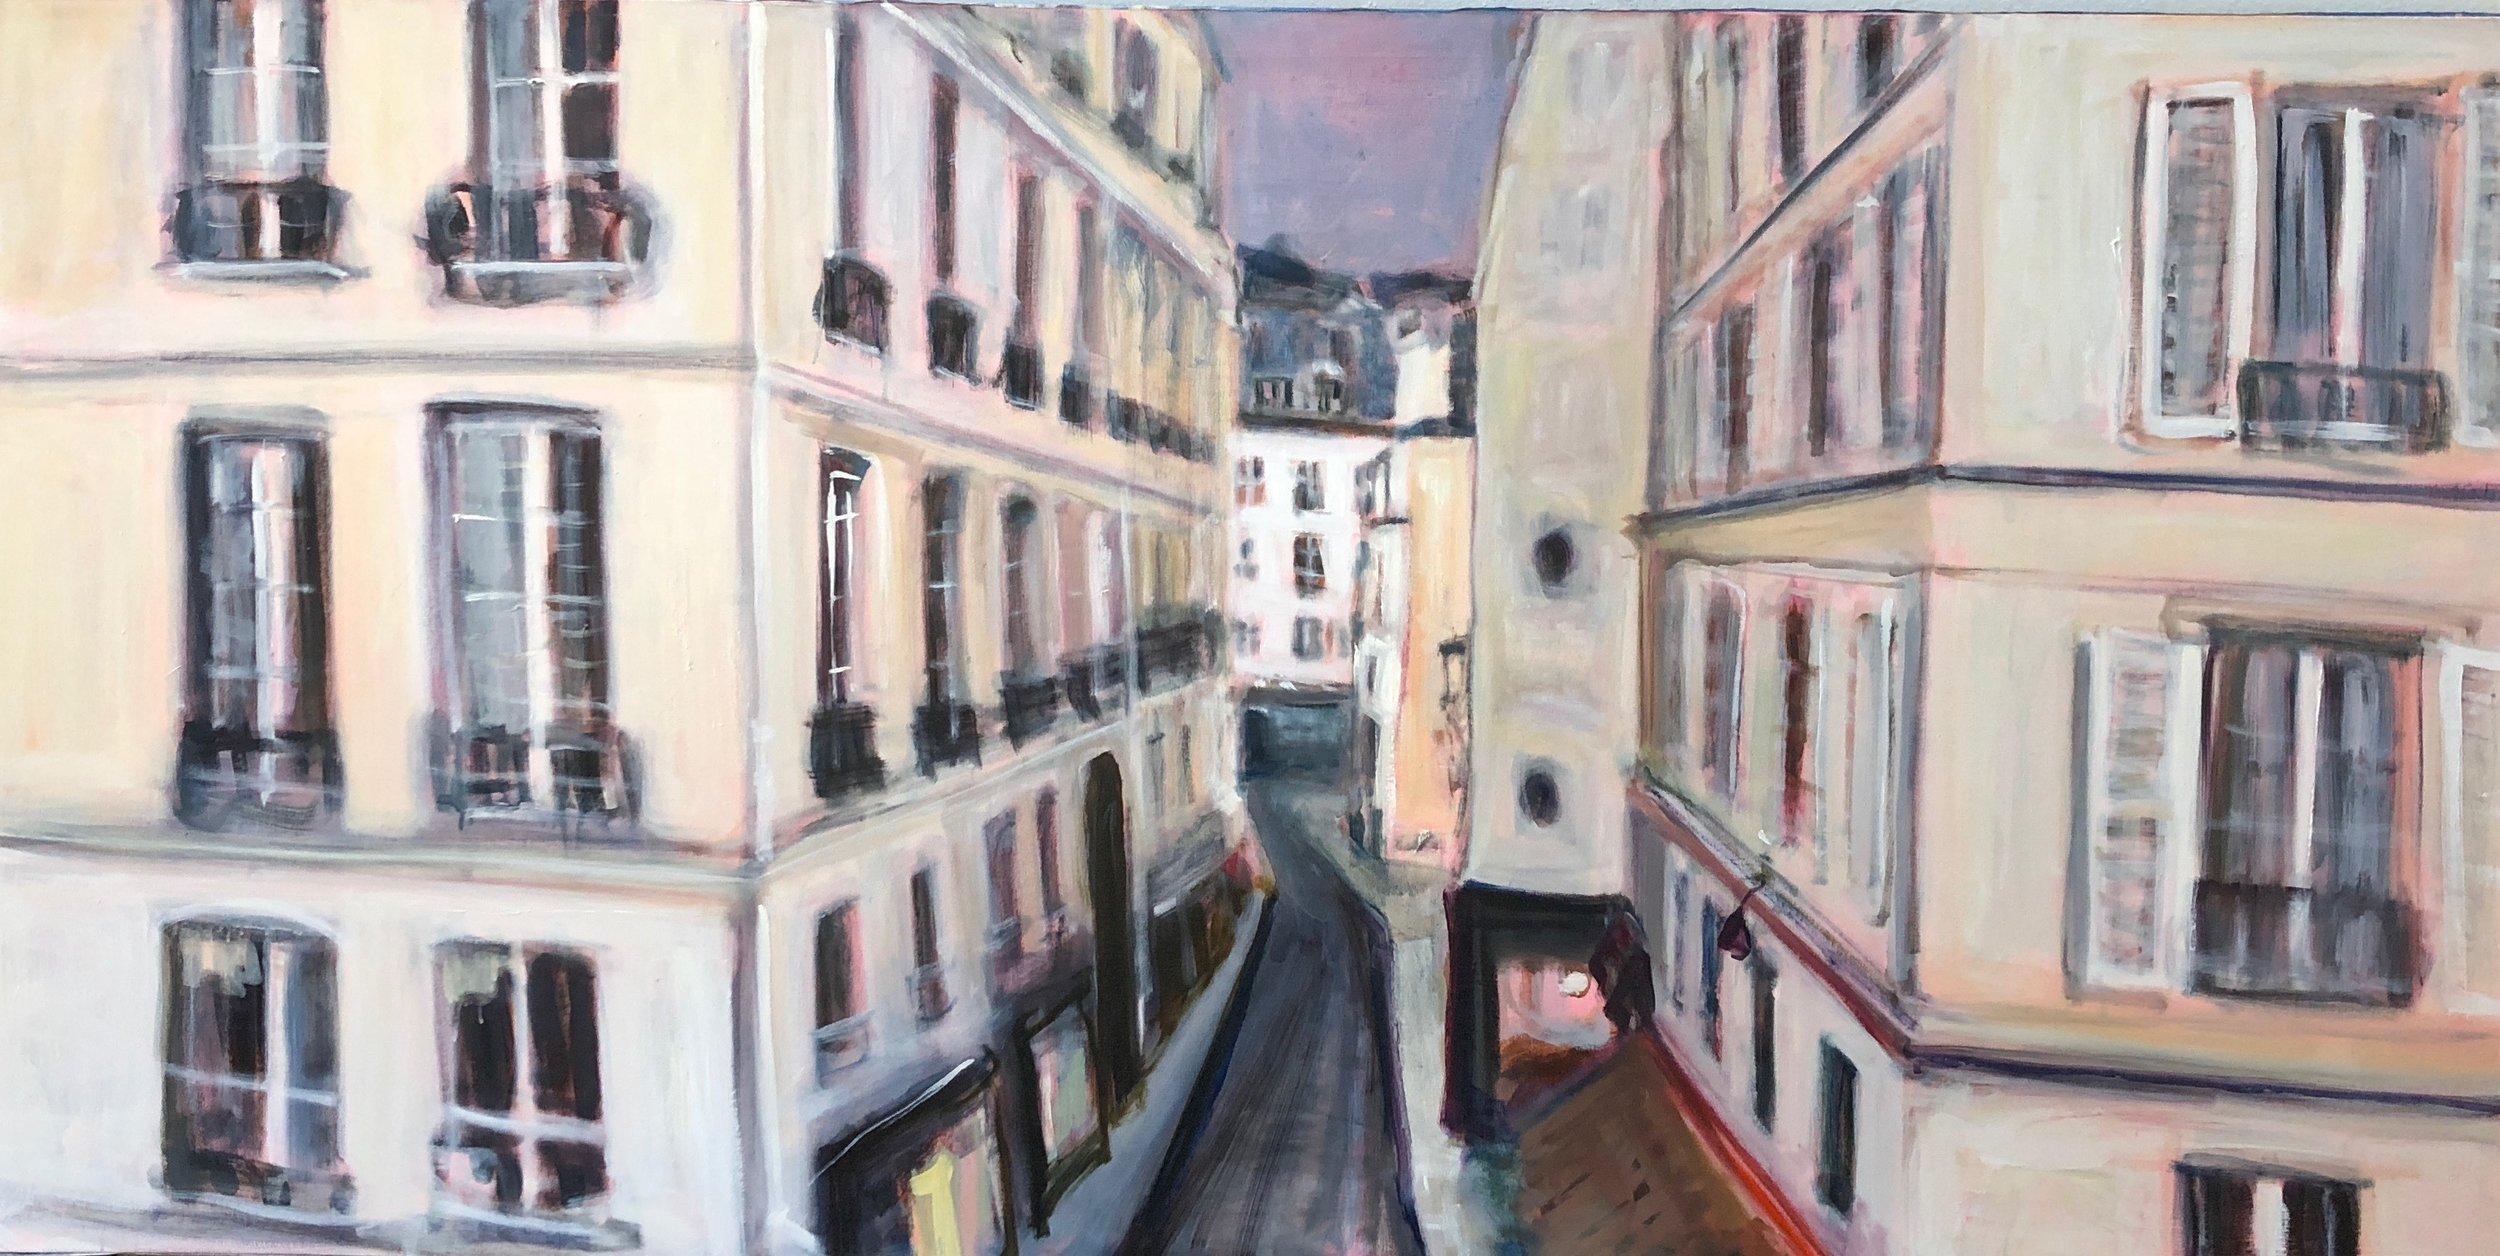 I can see Delacroix' studio